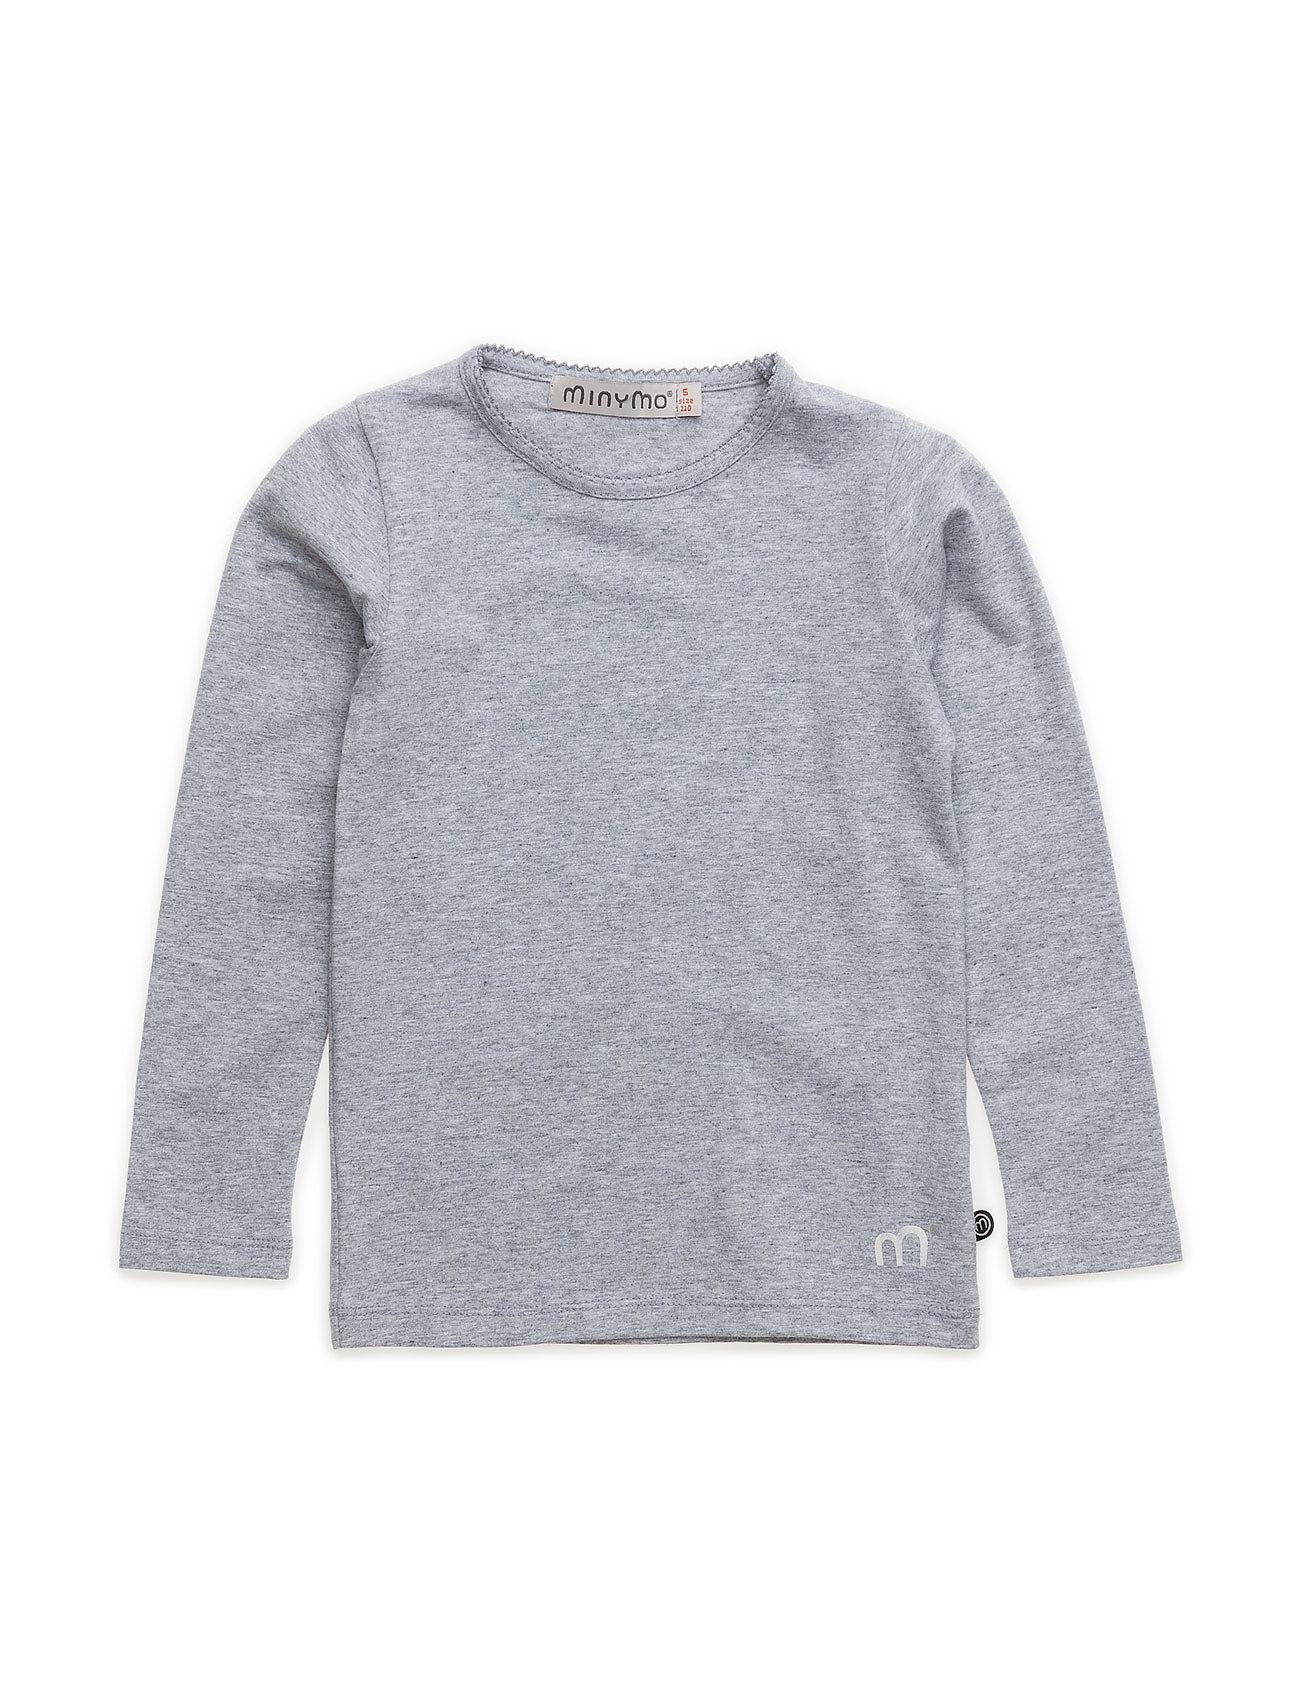 Minymo Basic T-shirt LS -solid - LIGHT GREY MELANGE